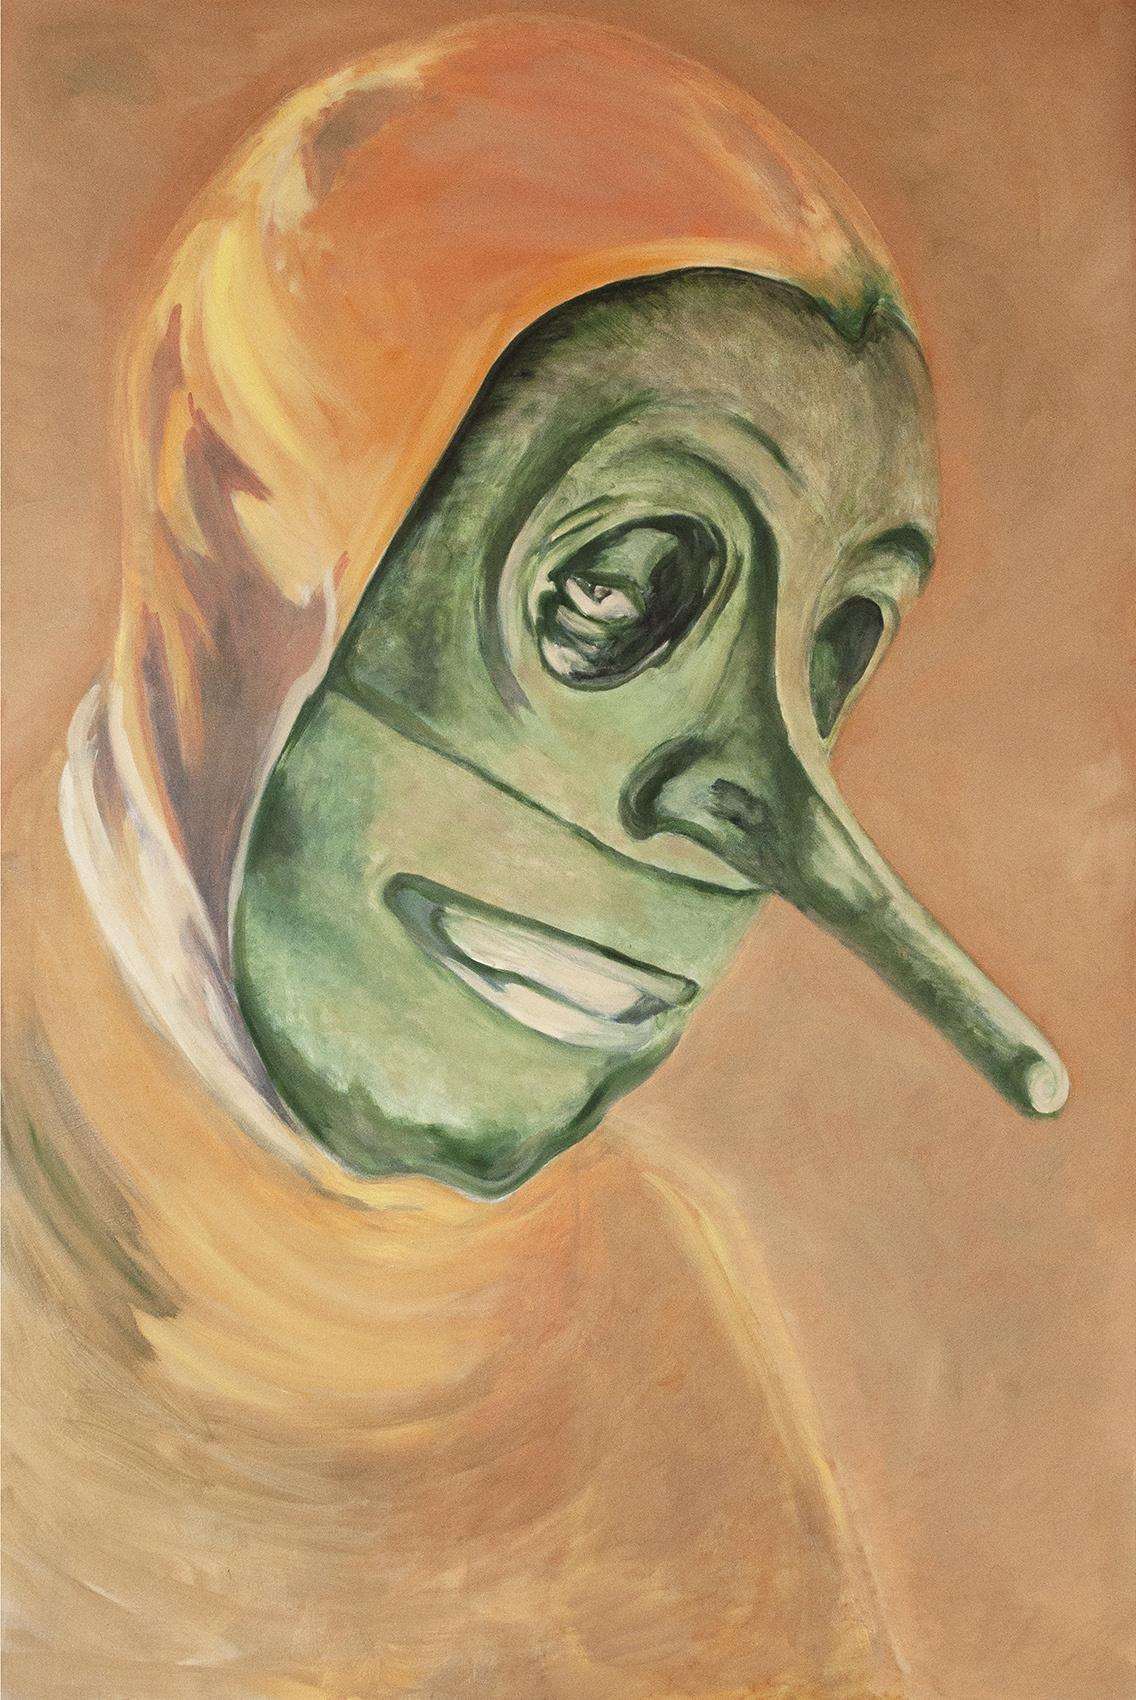 Ria Kacharava 8 #art живопись, искусство, Нью-Йорк, Риа Качарава, сша